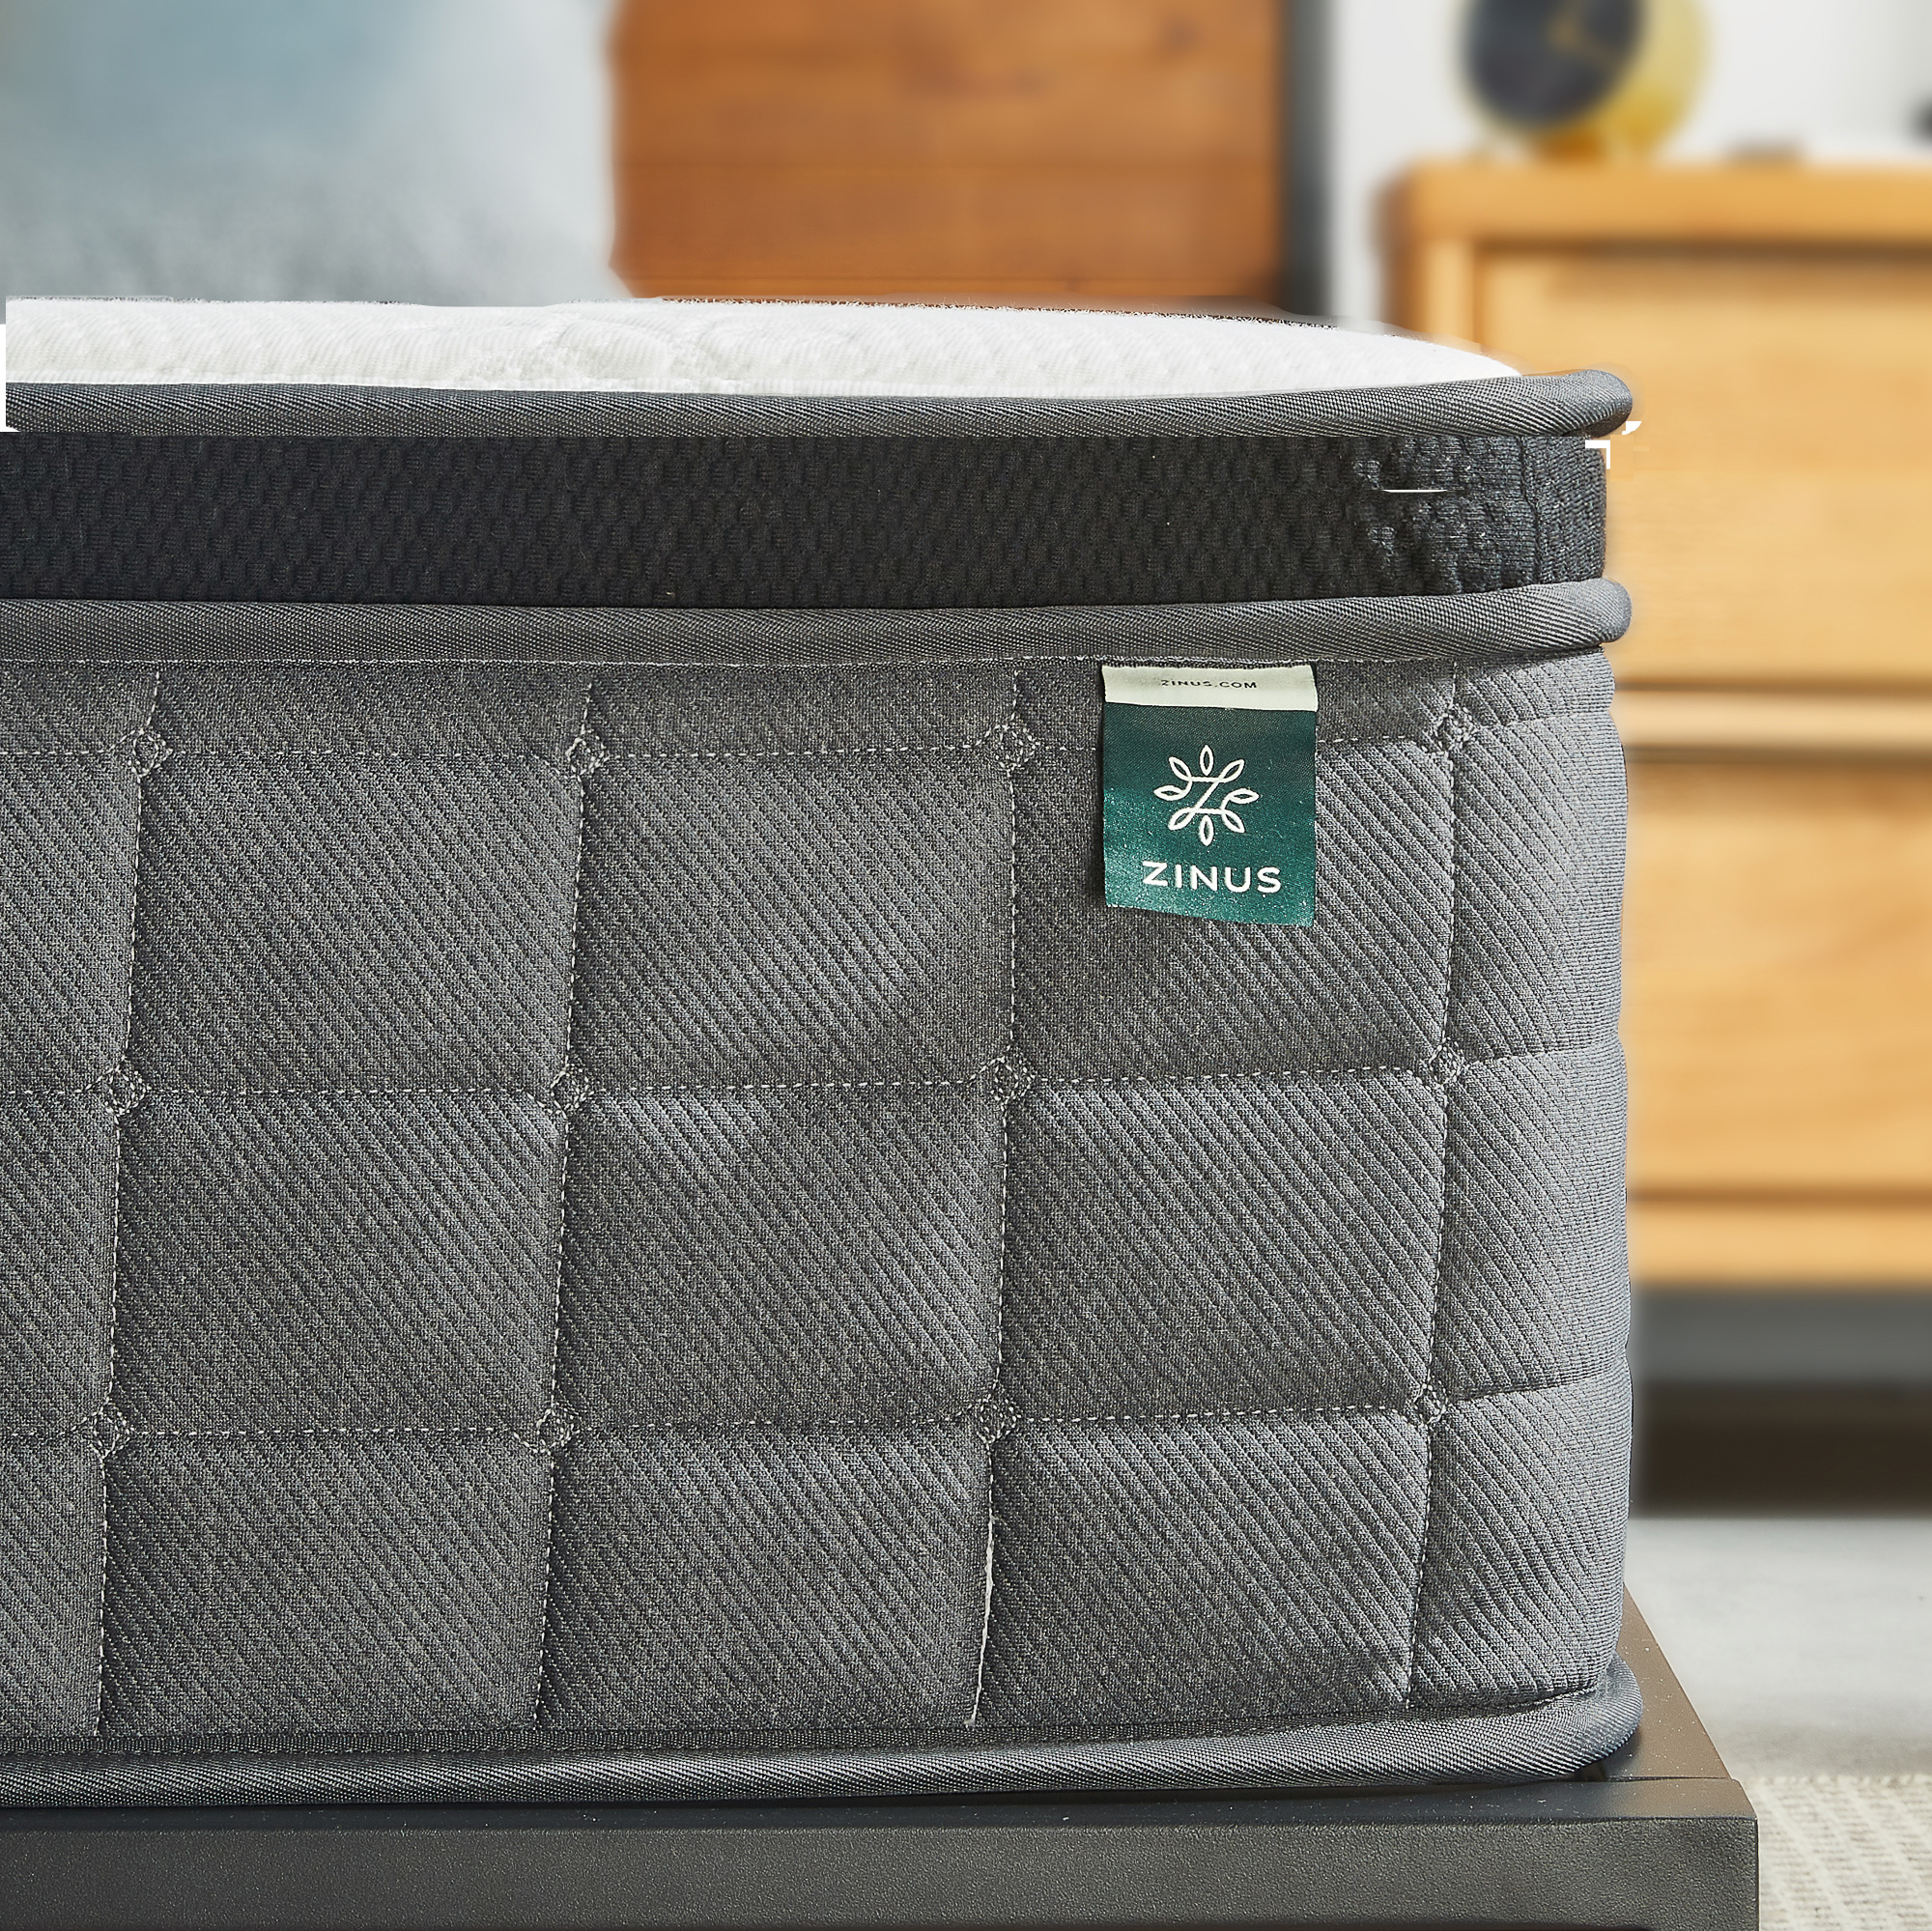 thumbnail 17 - Zinus Mattress Queen Double King Single Bed Memory Foam Pocket Spring Hybrid